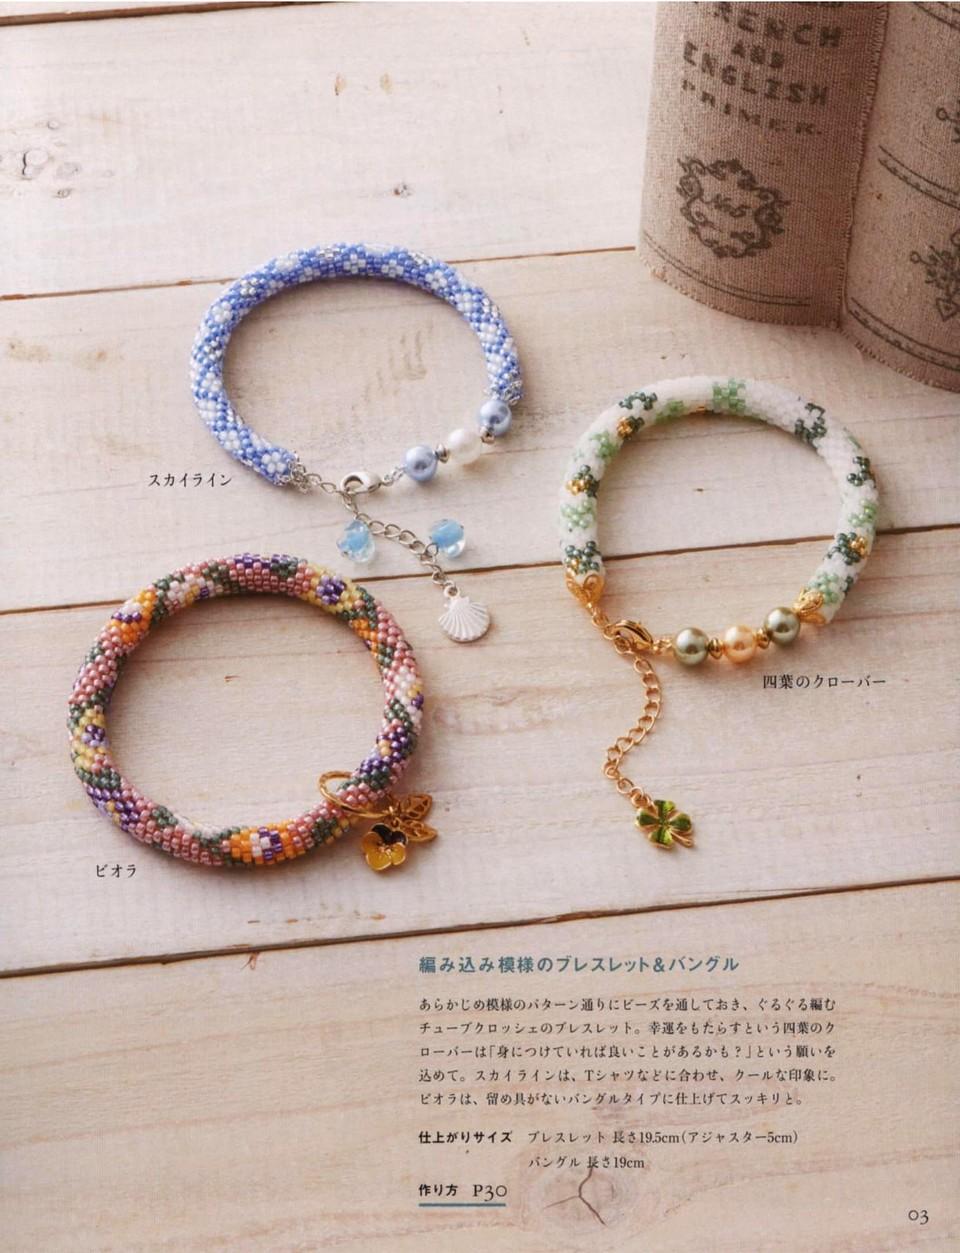 717 Beads Crochet 17-04